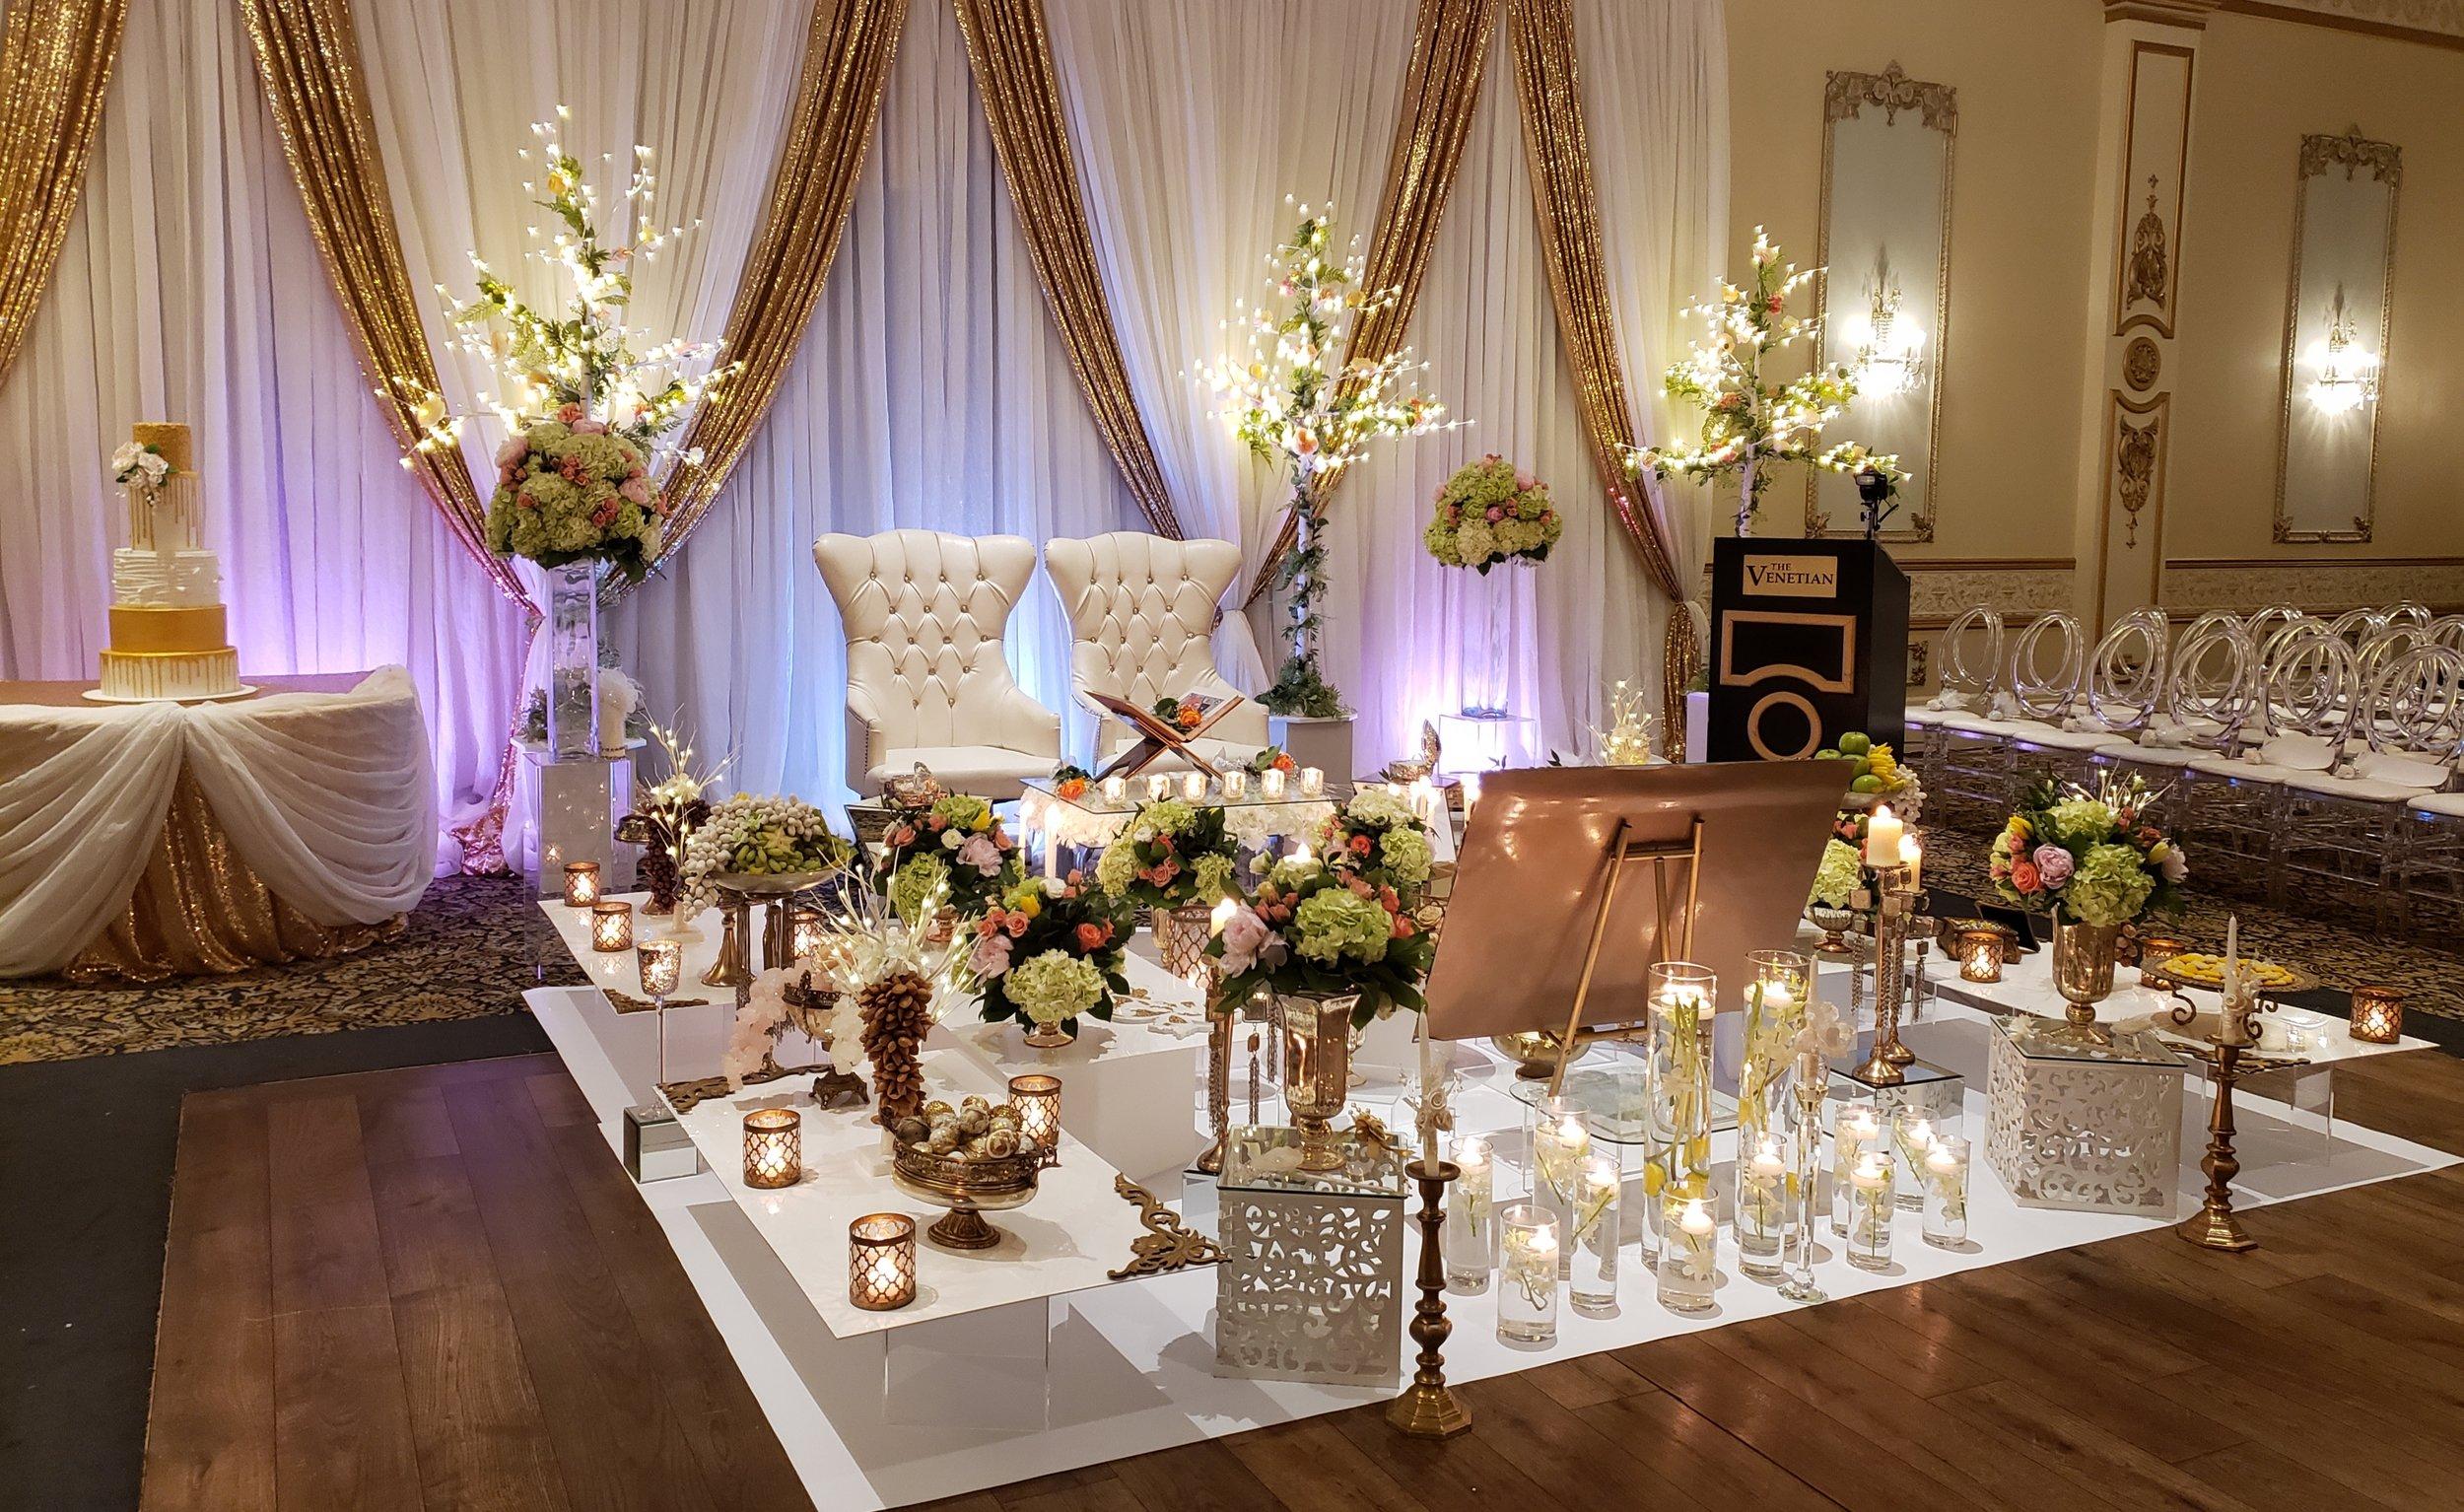 Antique with white vinyl - Venetian banquet hall